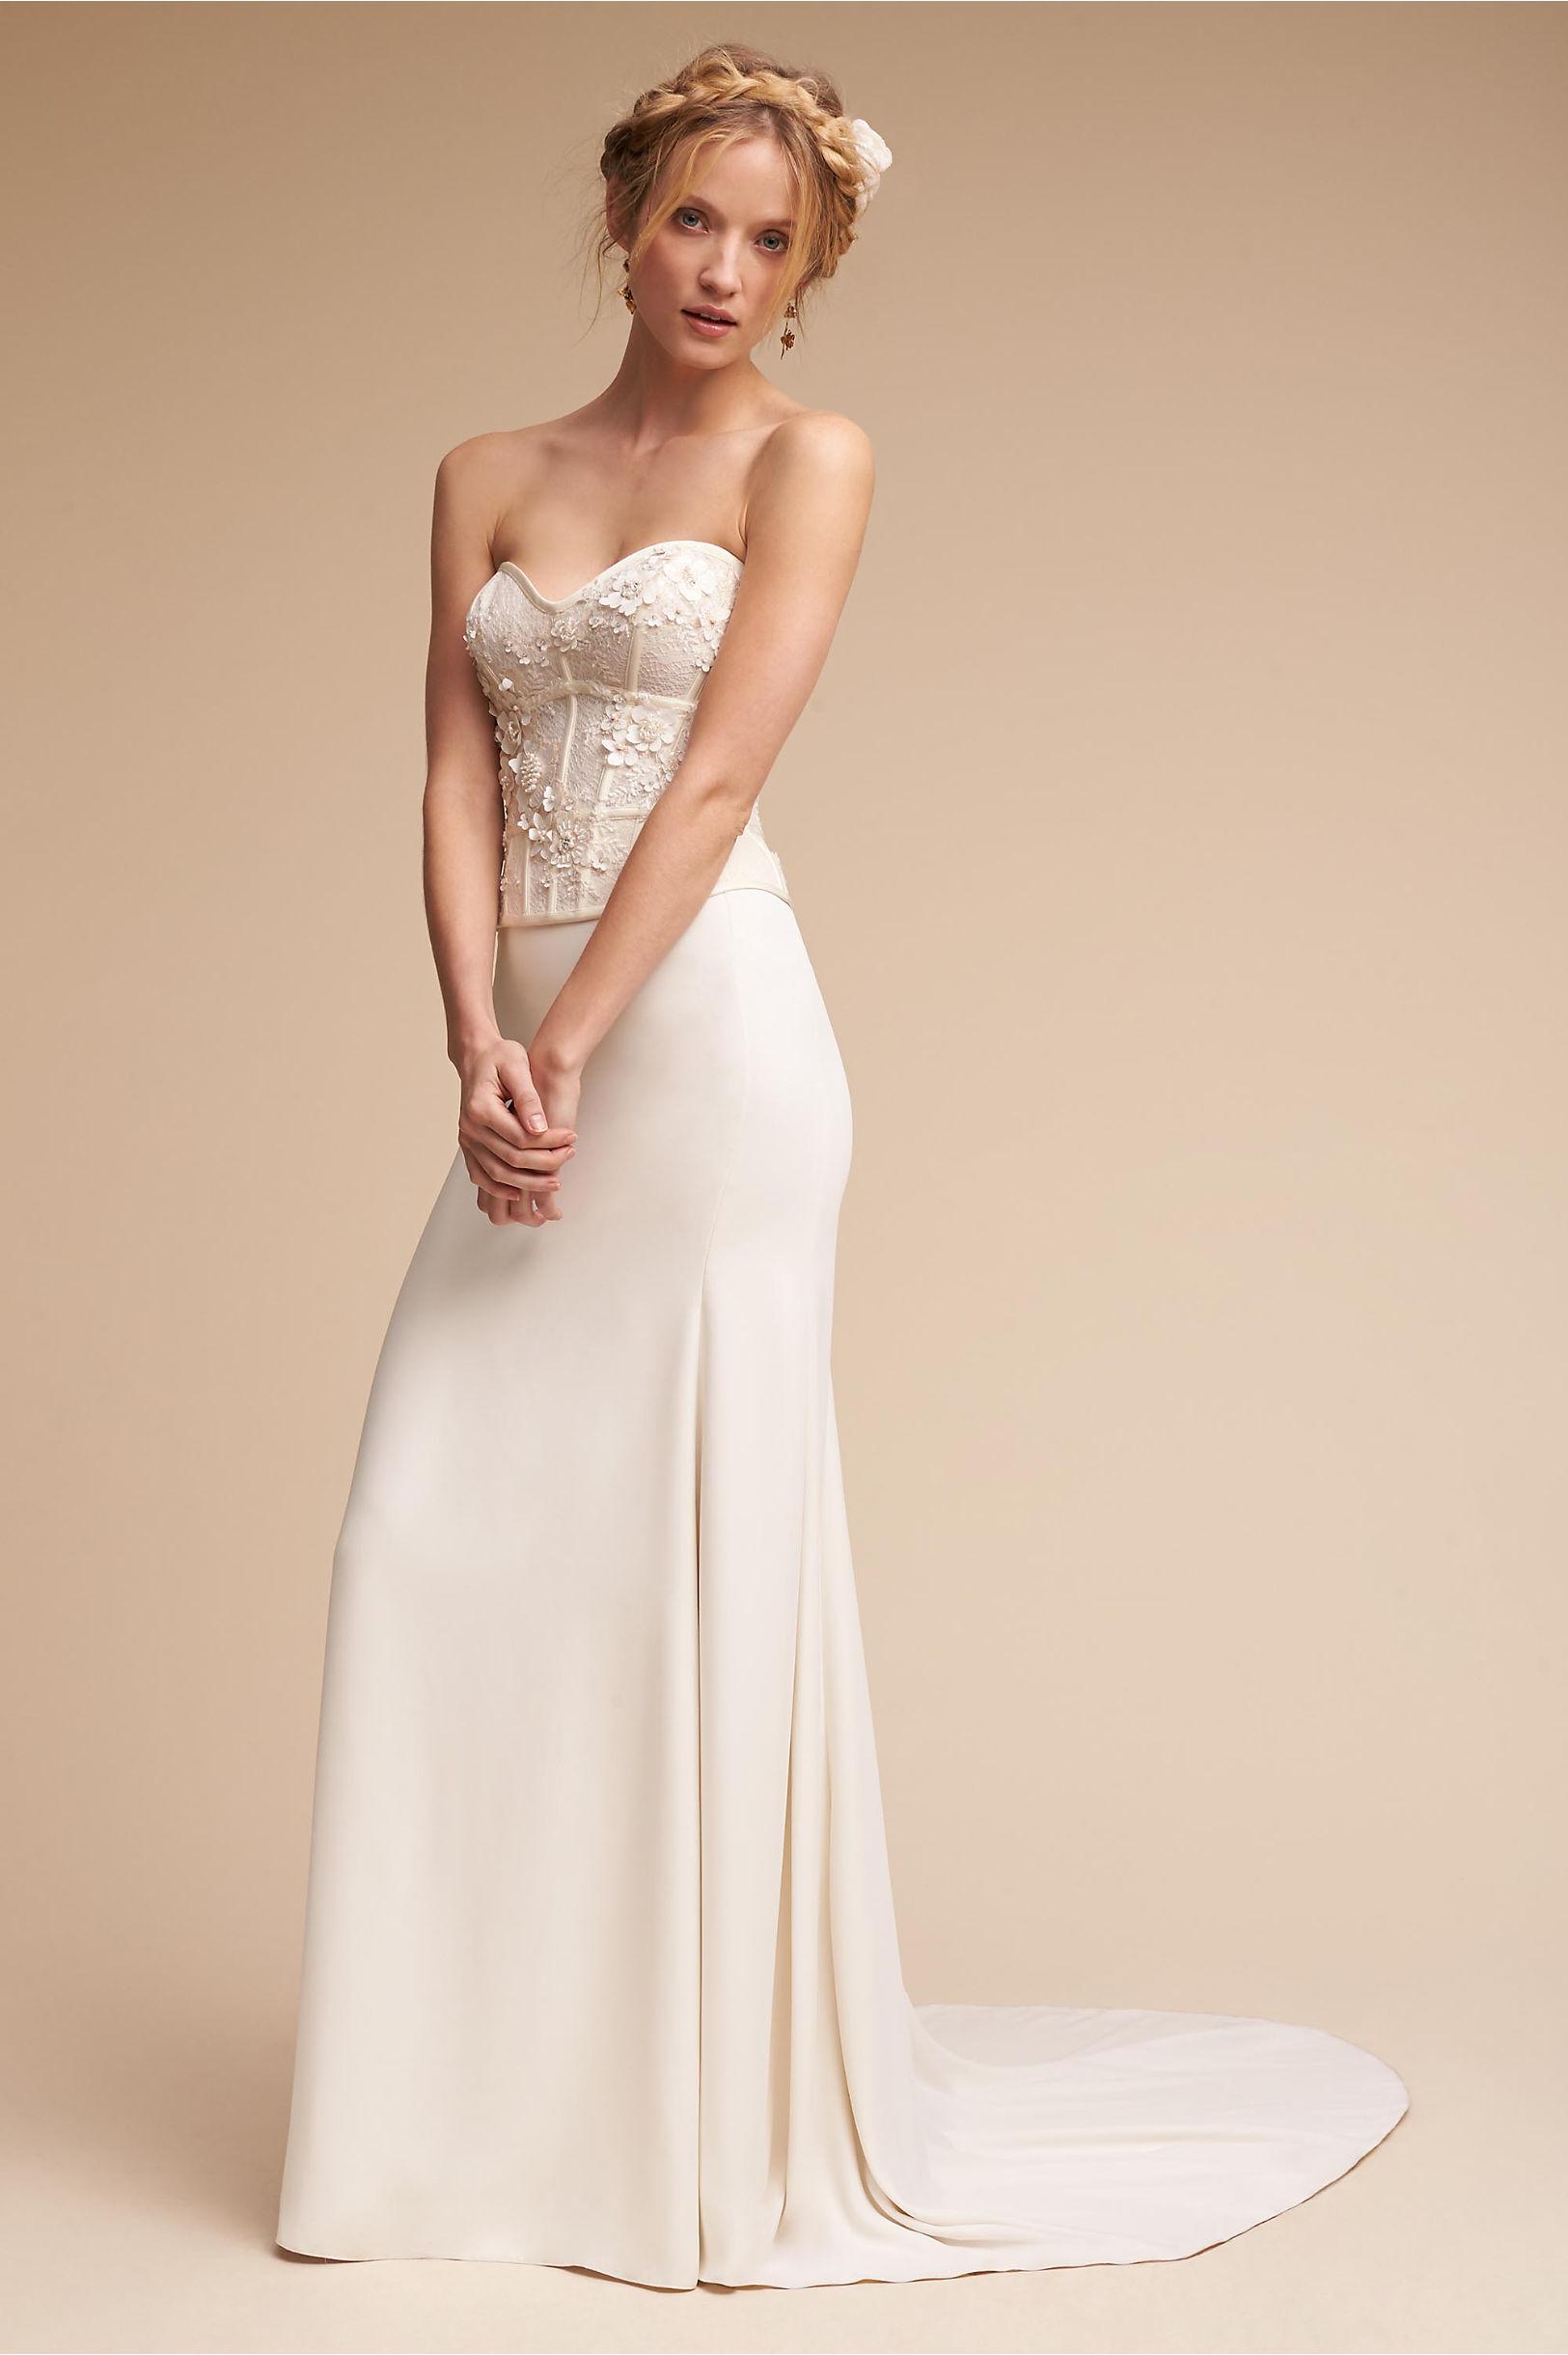 bride bridal separates wedding dress corset top Maryna Corset Top Sade Skirt